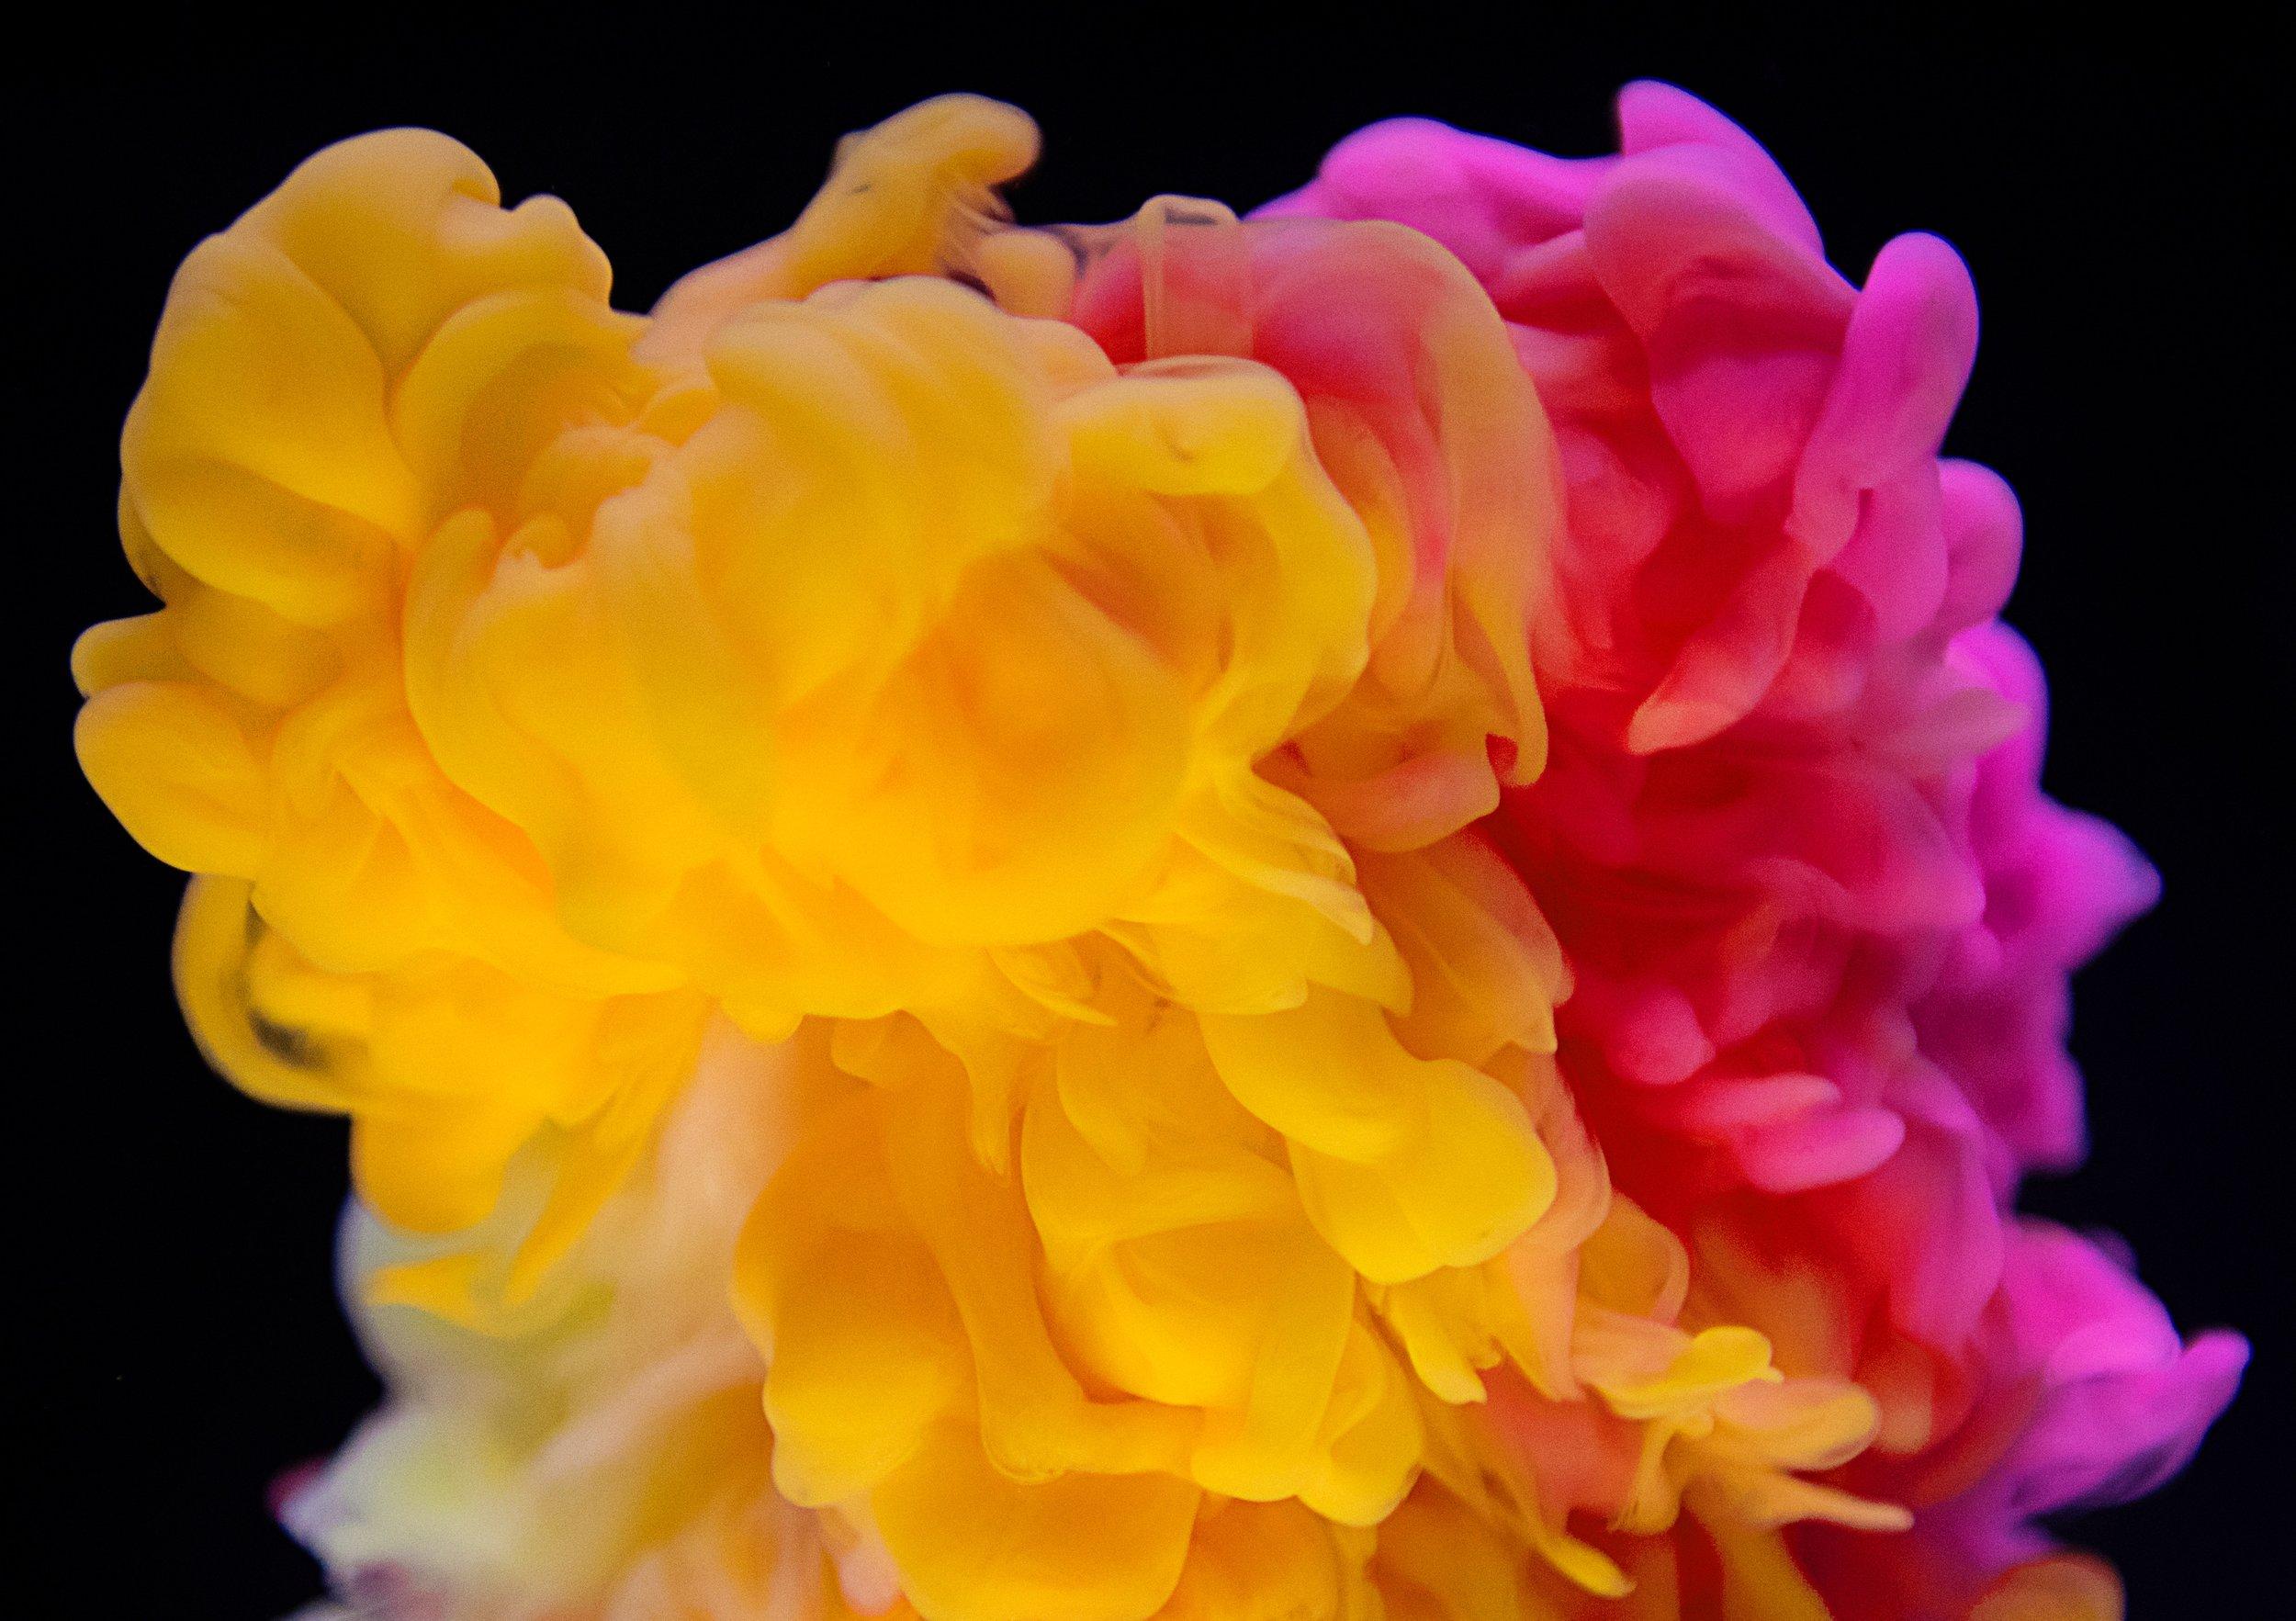 rawpixel-yellow and orange flourish_unsplash.jpg